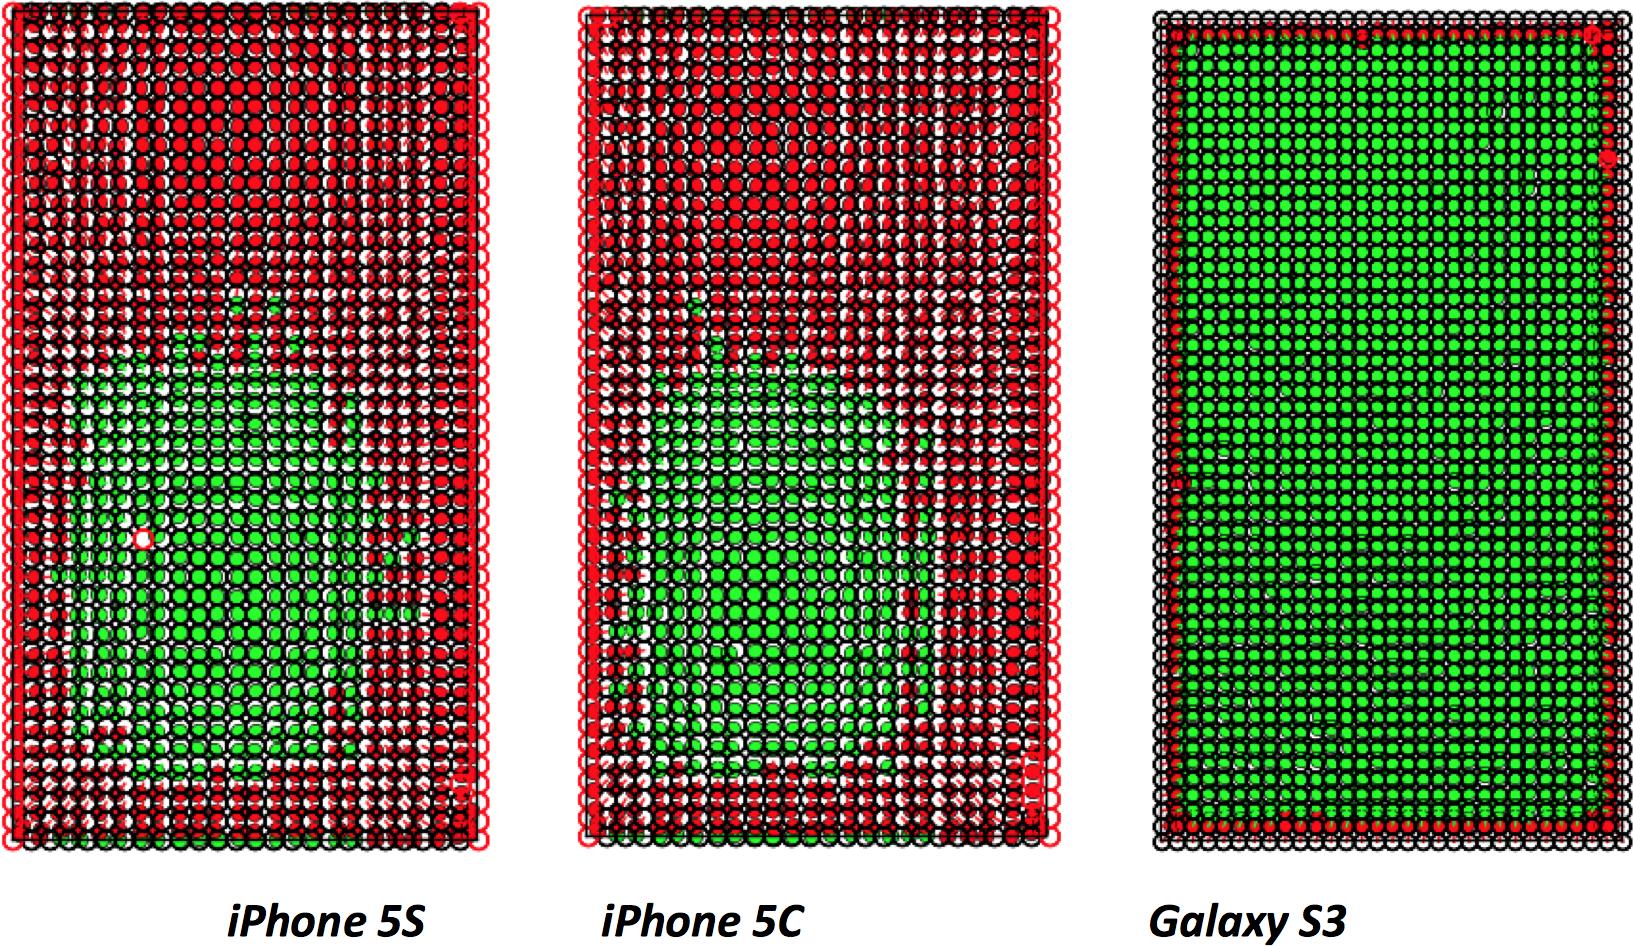 Estudo da OptofFdelity - Telas de iPhones